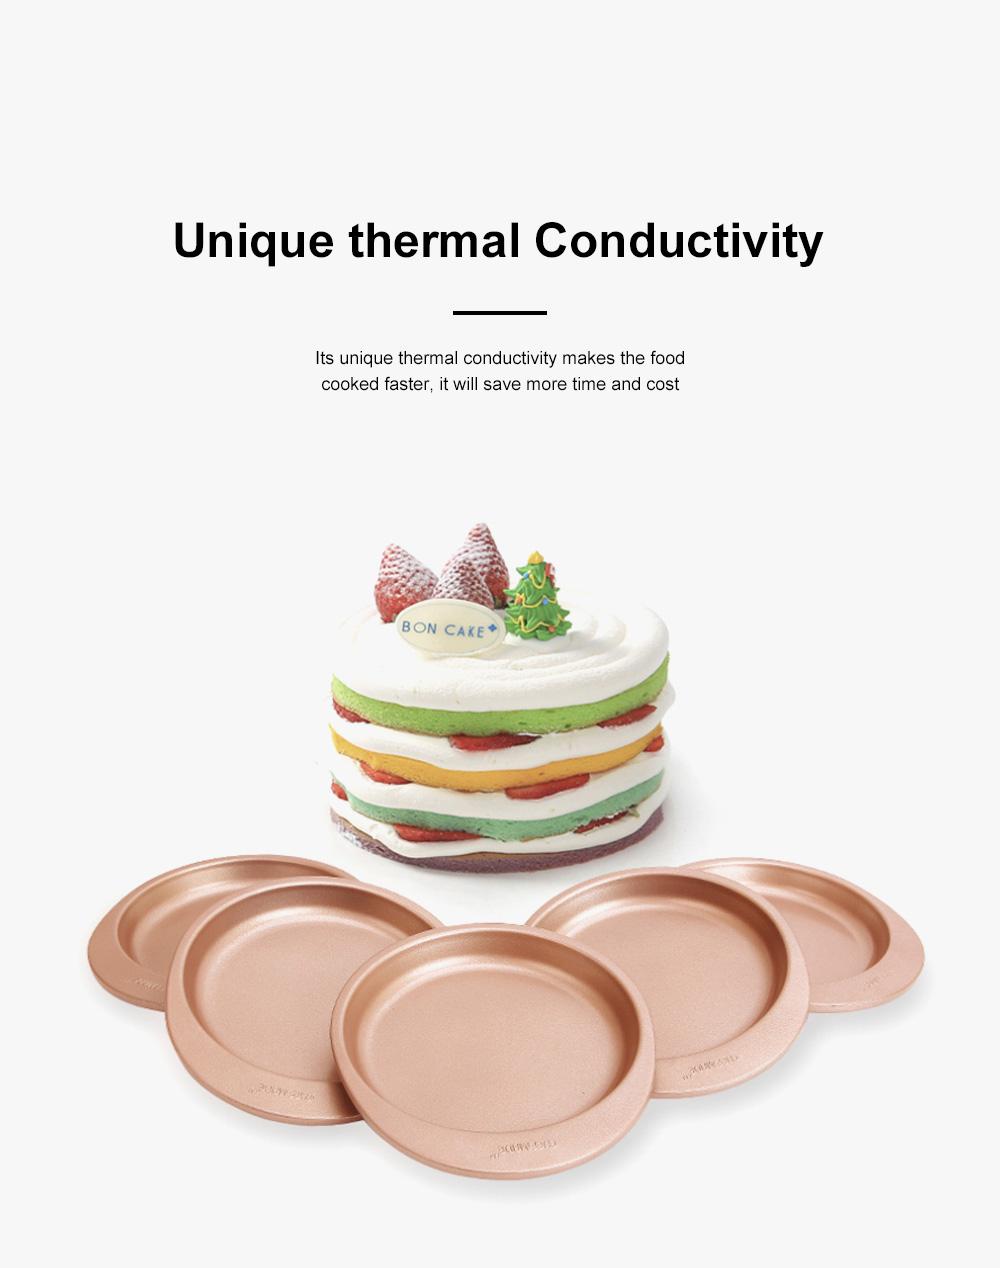 Chefmade Silicone Rainbow Cake Mould Bakeware Round DIY Baking Pan Silicone Cake Pans For Baking 5pcs 4